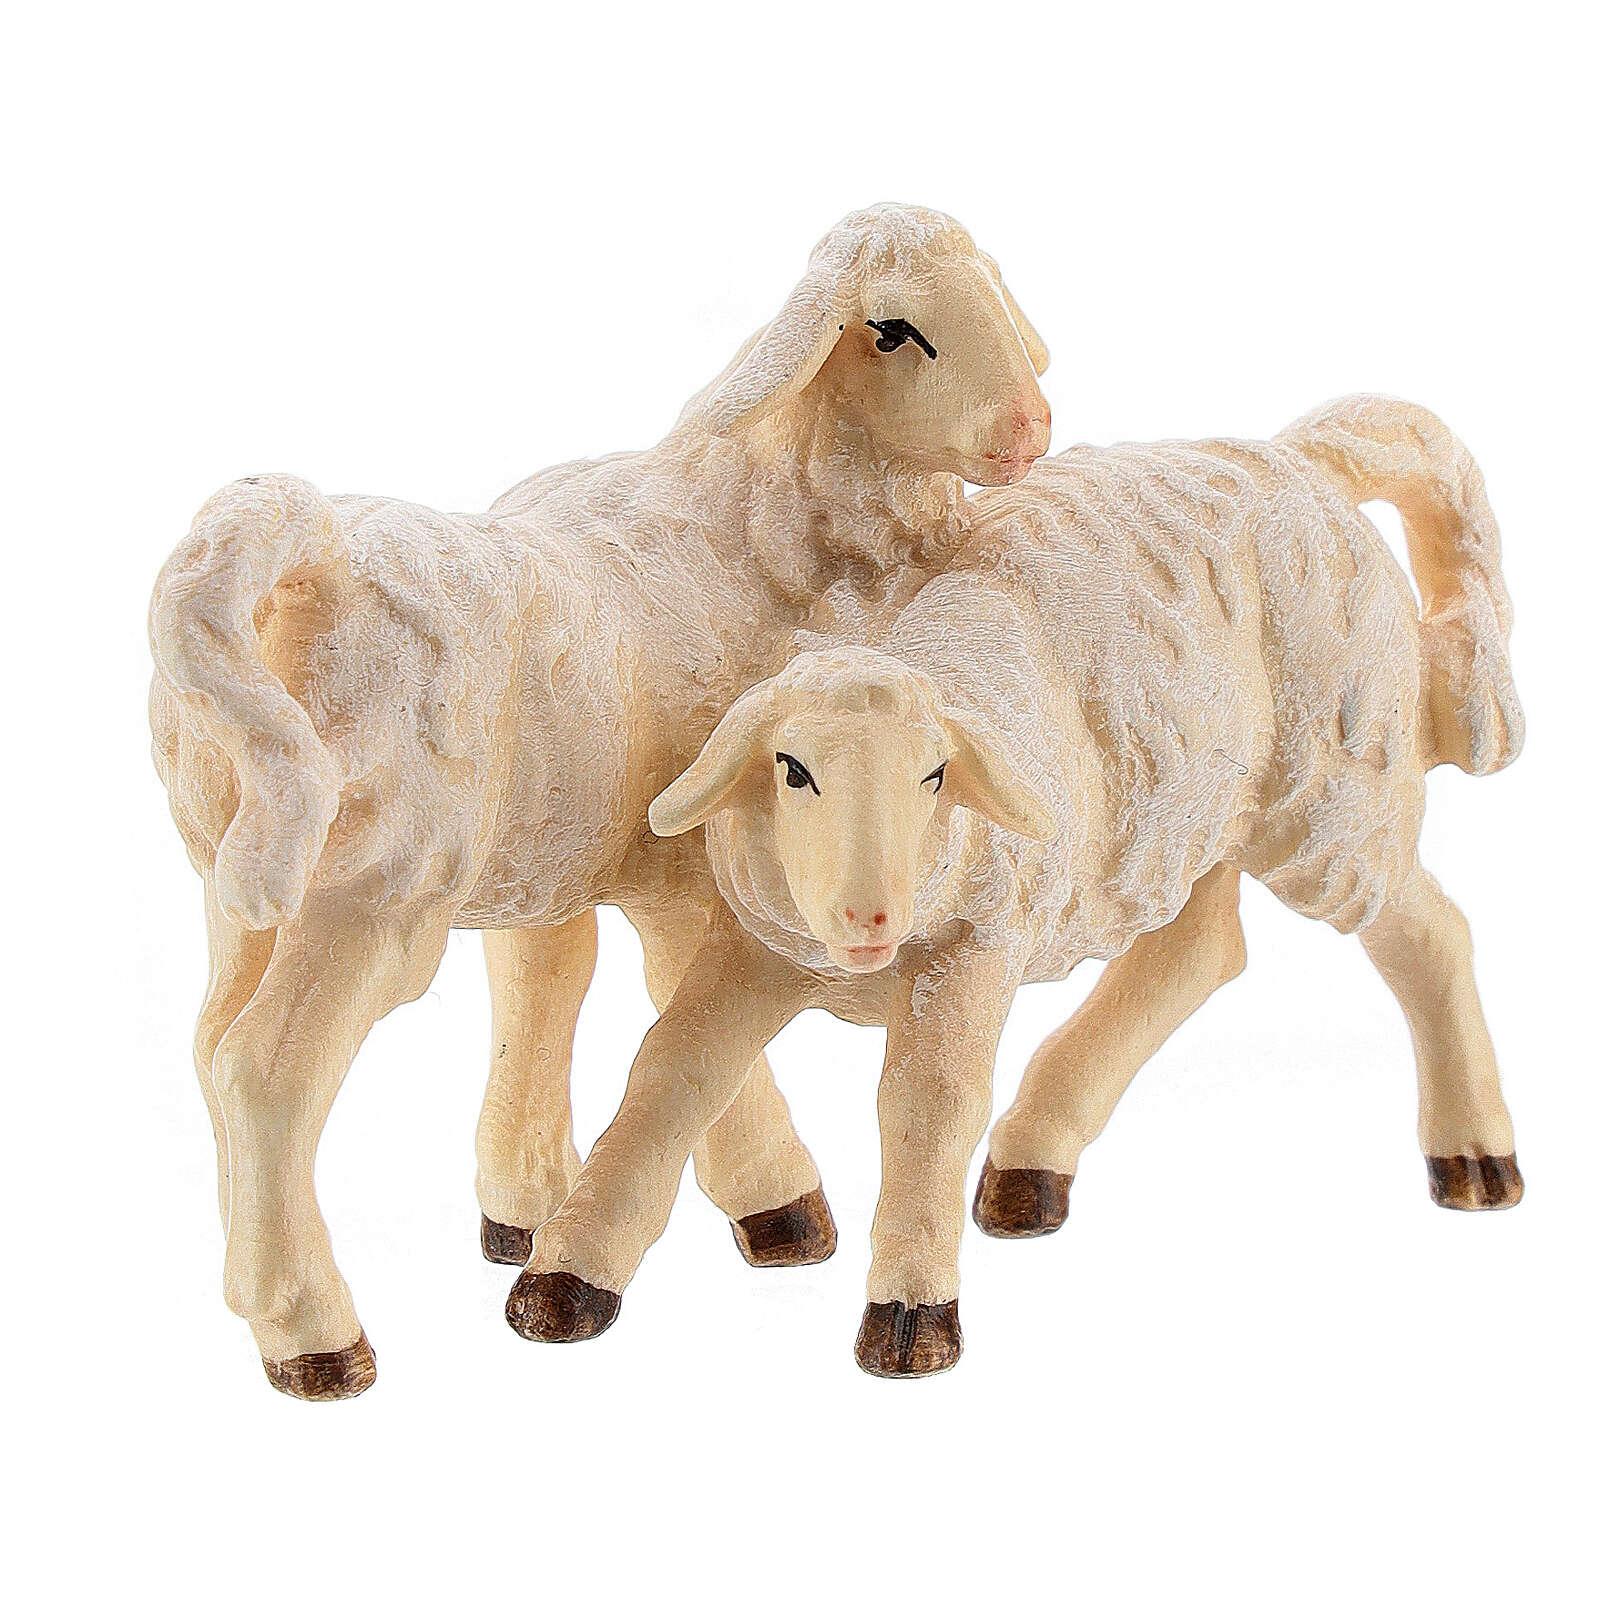 Kostner Nativity Scene 12 cm, group of white sheep, in painted wood 4